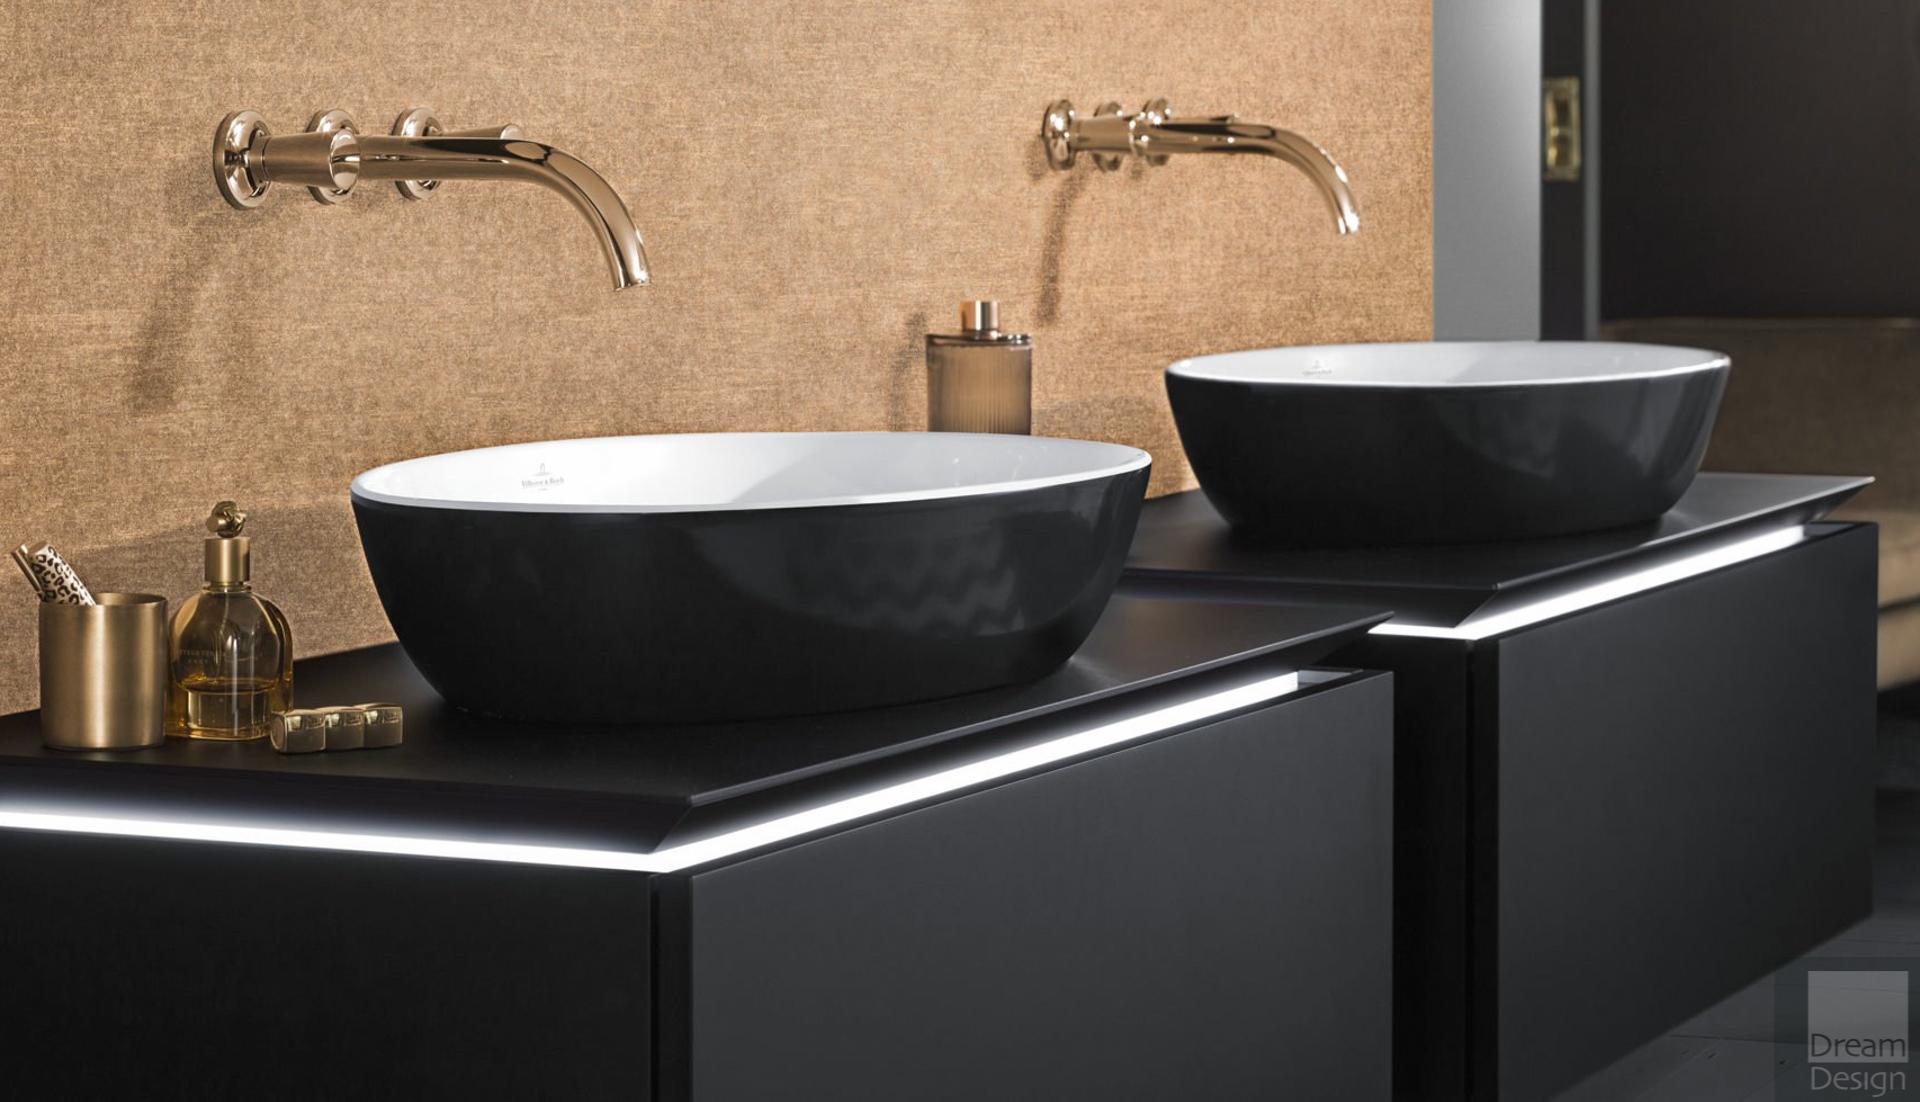 villeroy boch artis basin dream design interiors ltd. Black Bedroom Furniture Sets. Home Design Ideas